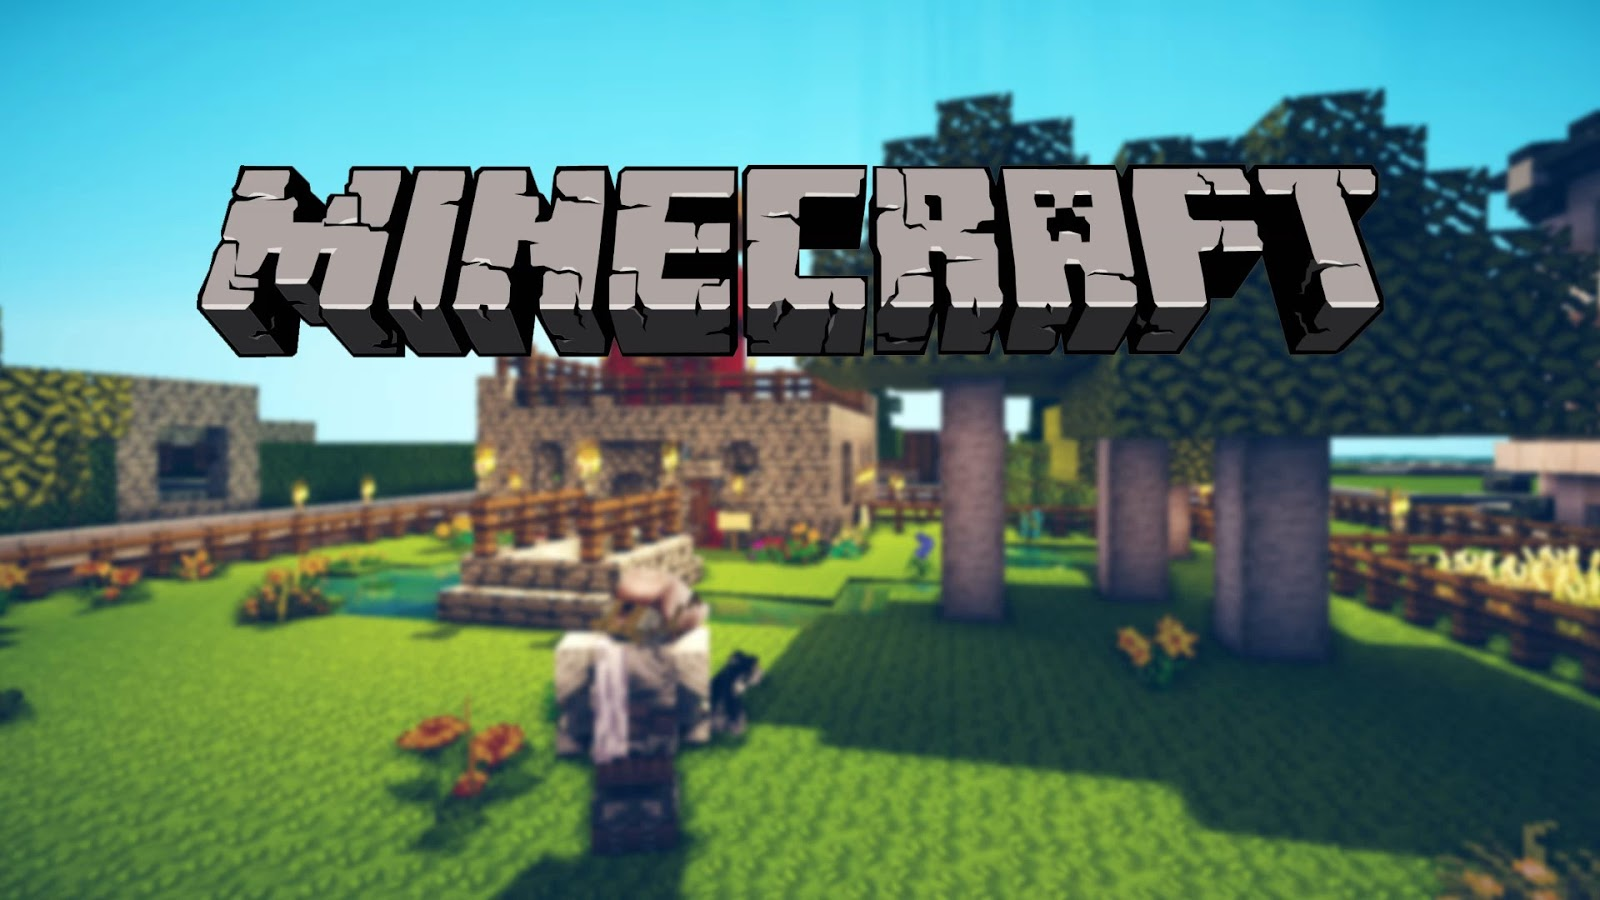 Amazing Wallpaper Minecraft Computer - Minecraft-Wallpaper-7  Snapshot_401097.jpg